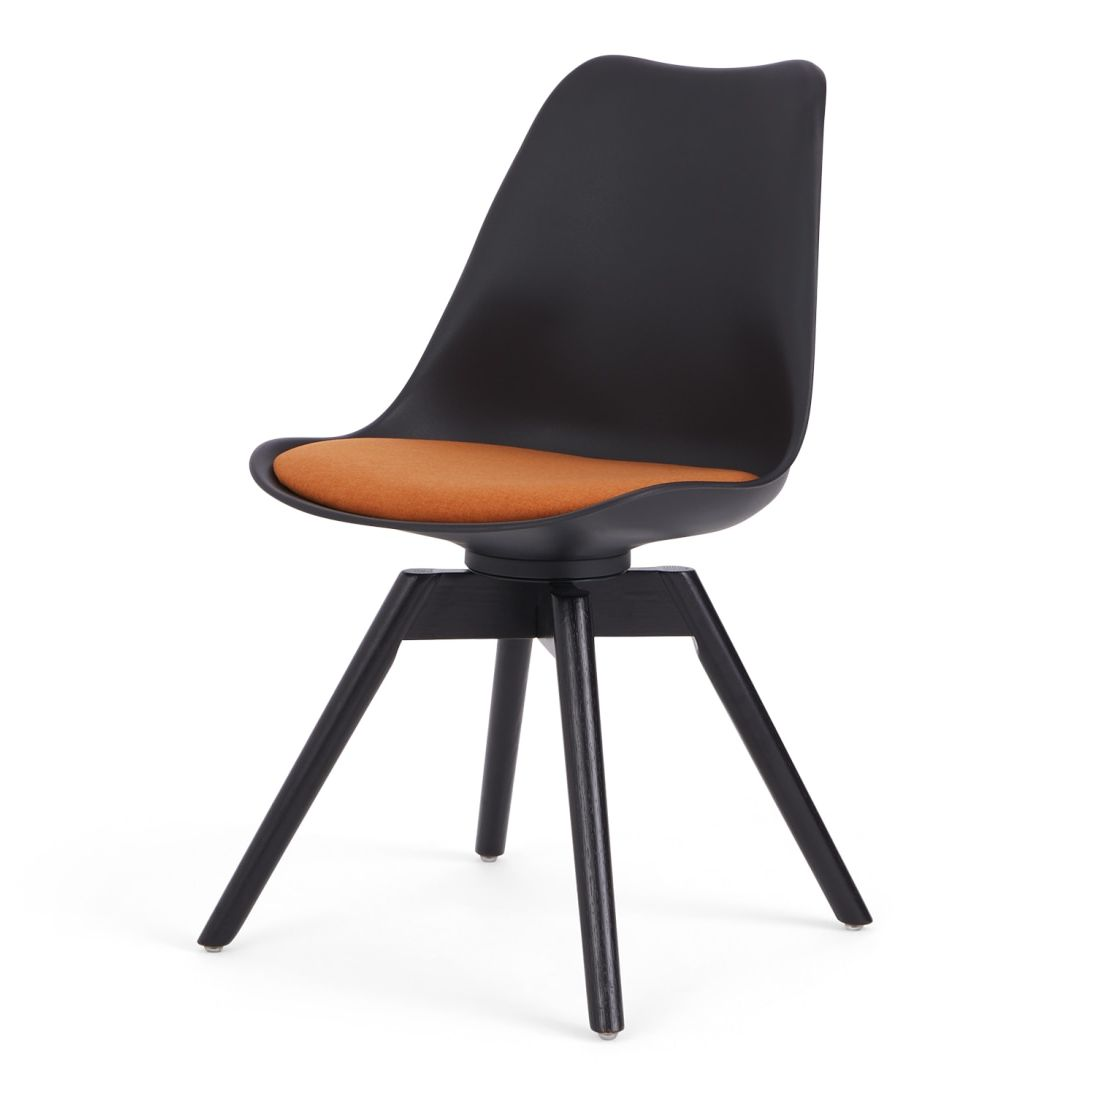 Aldi Launches Velvet Scalloped Chair — Aldi Special Buys